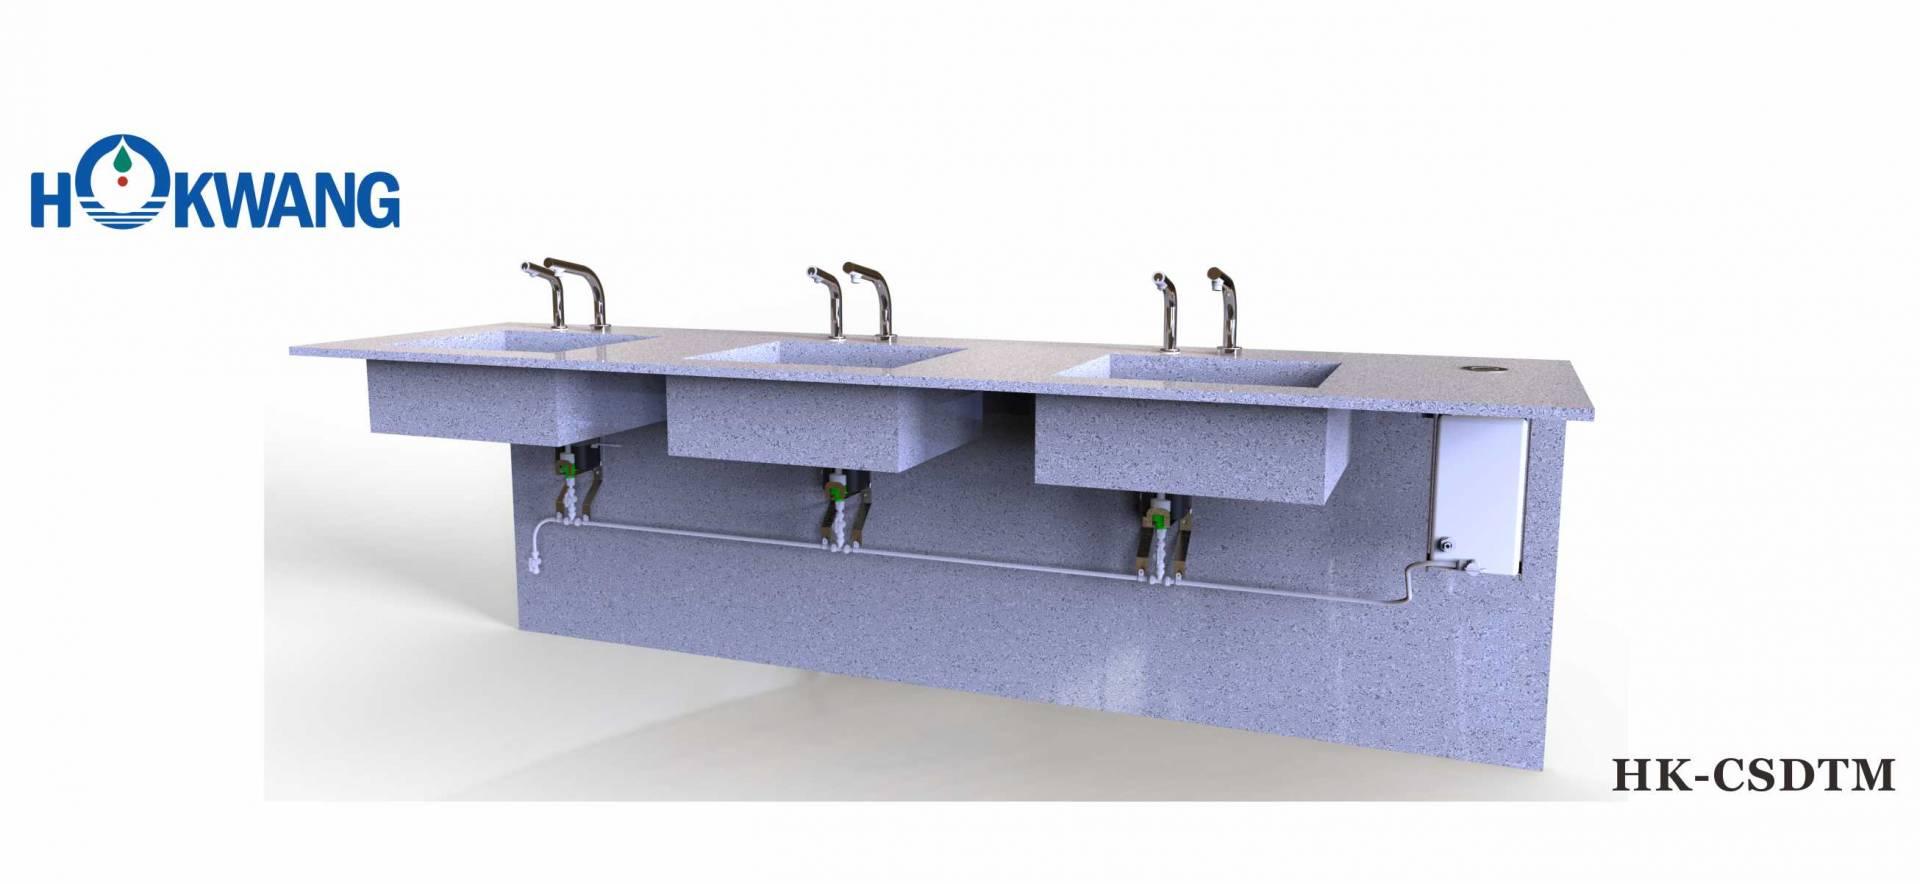 HK-CSDTM Multi-feed Auto Soap Dispenser System